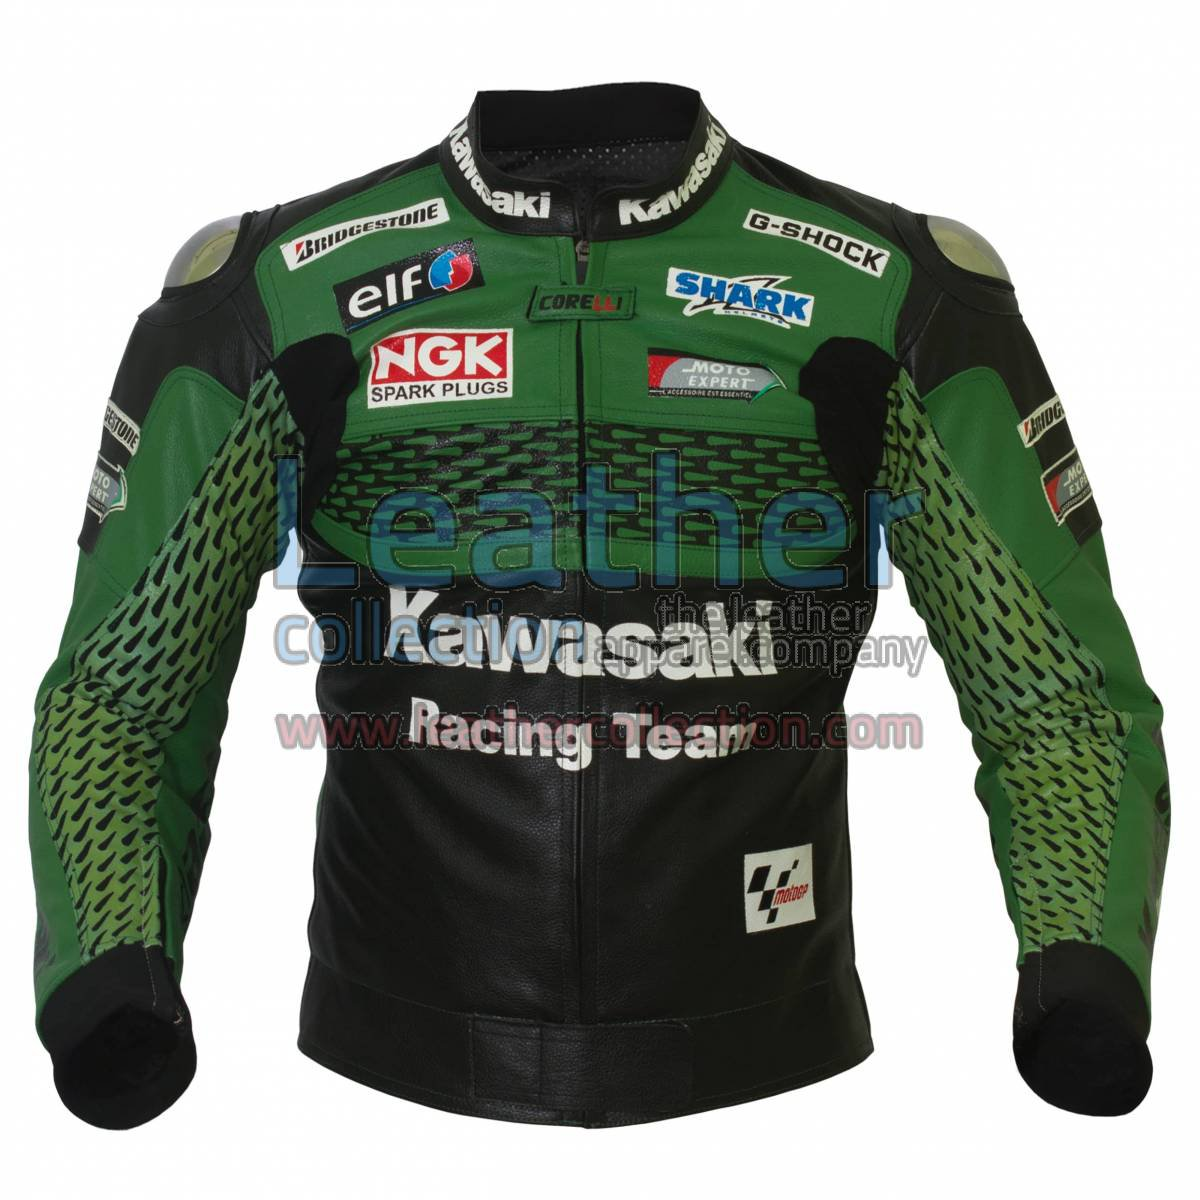 Kawasaki Racing Team Leather Jacket